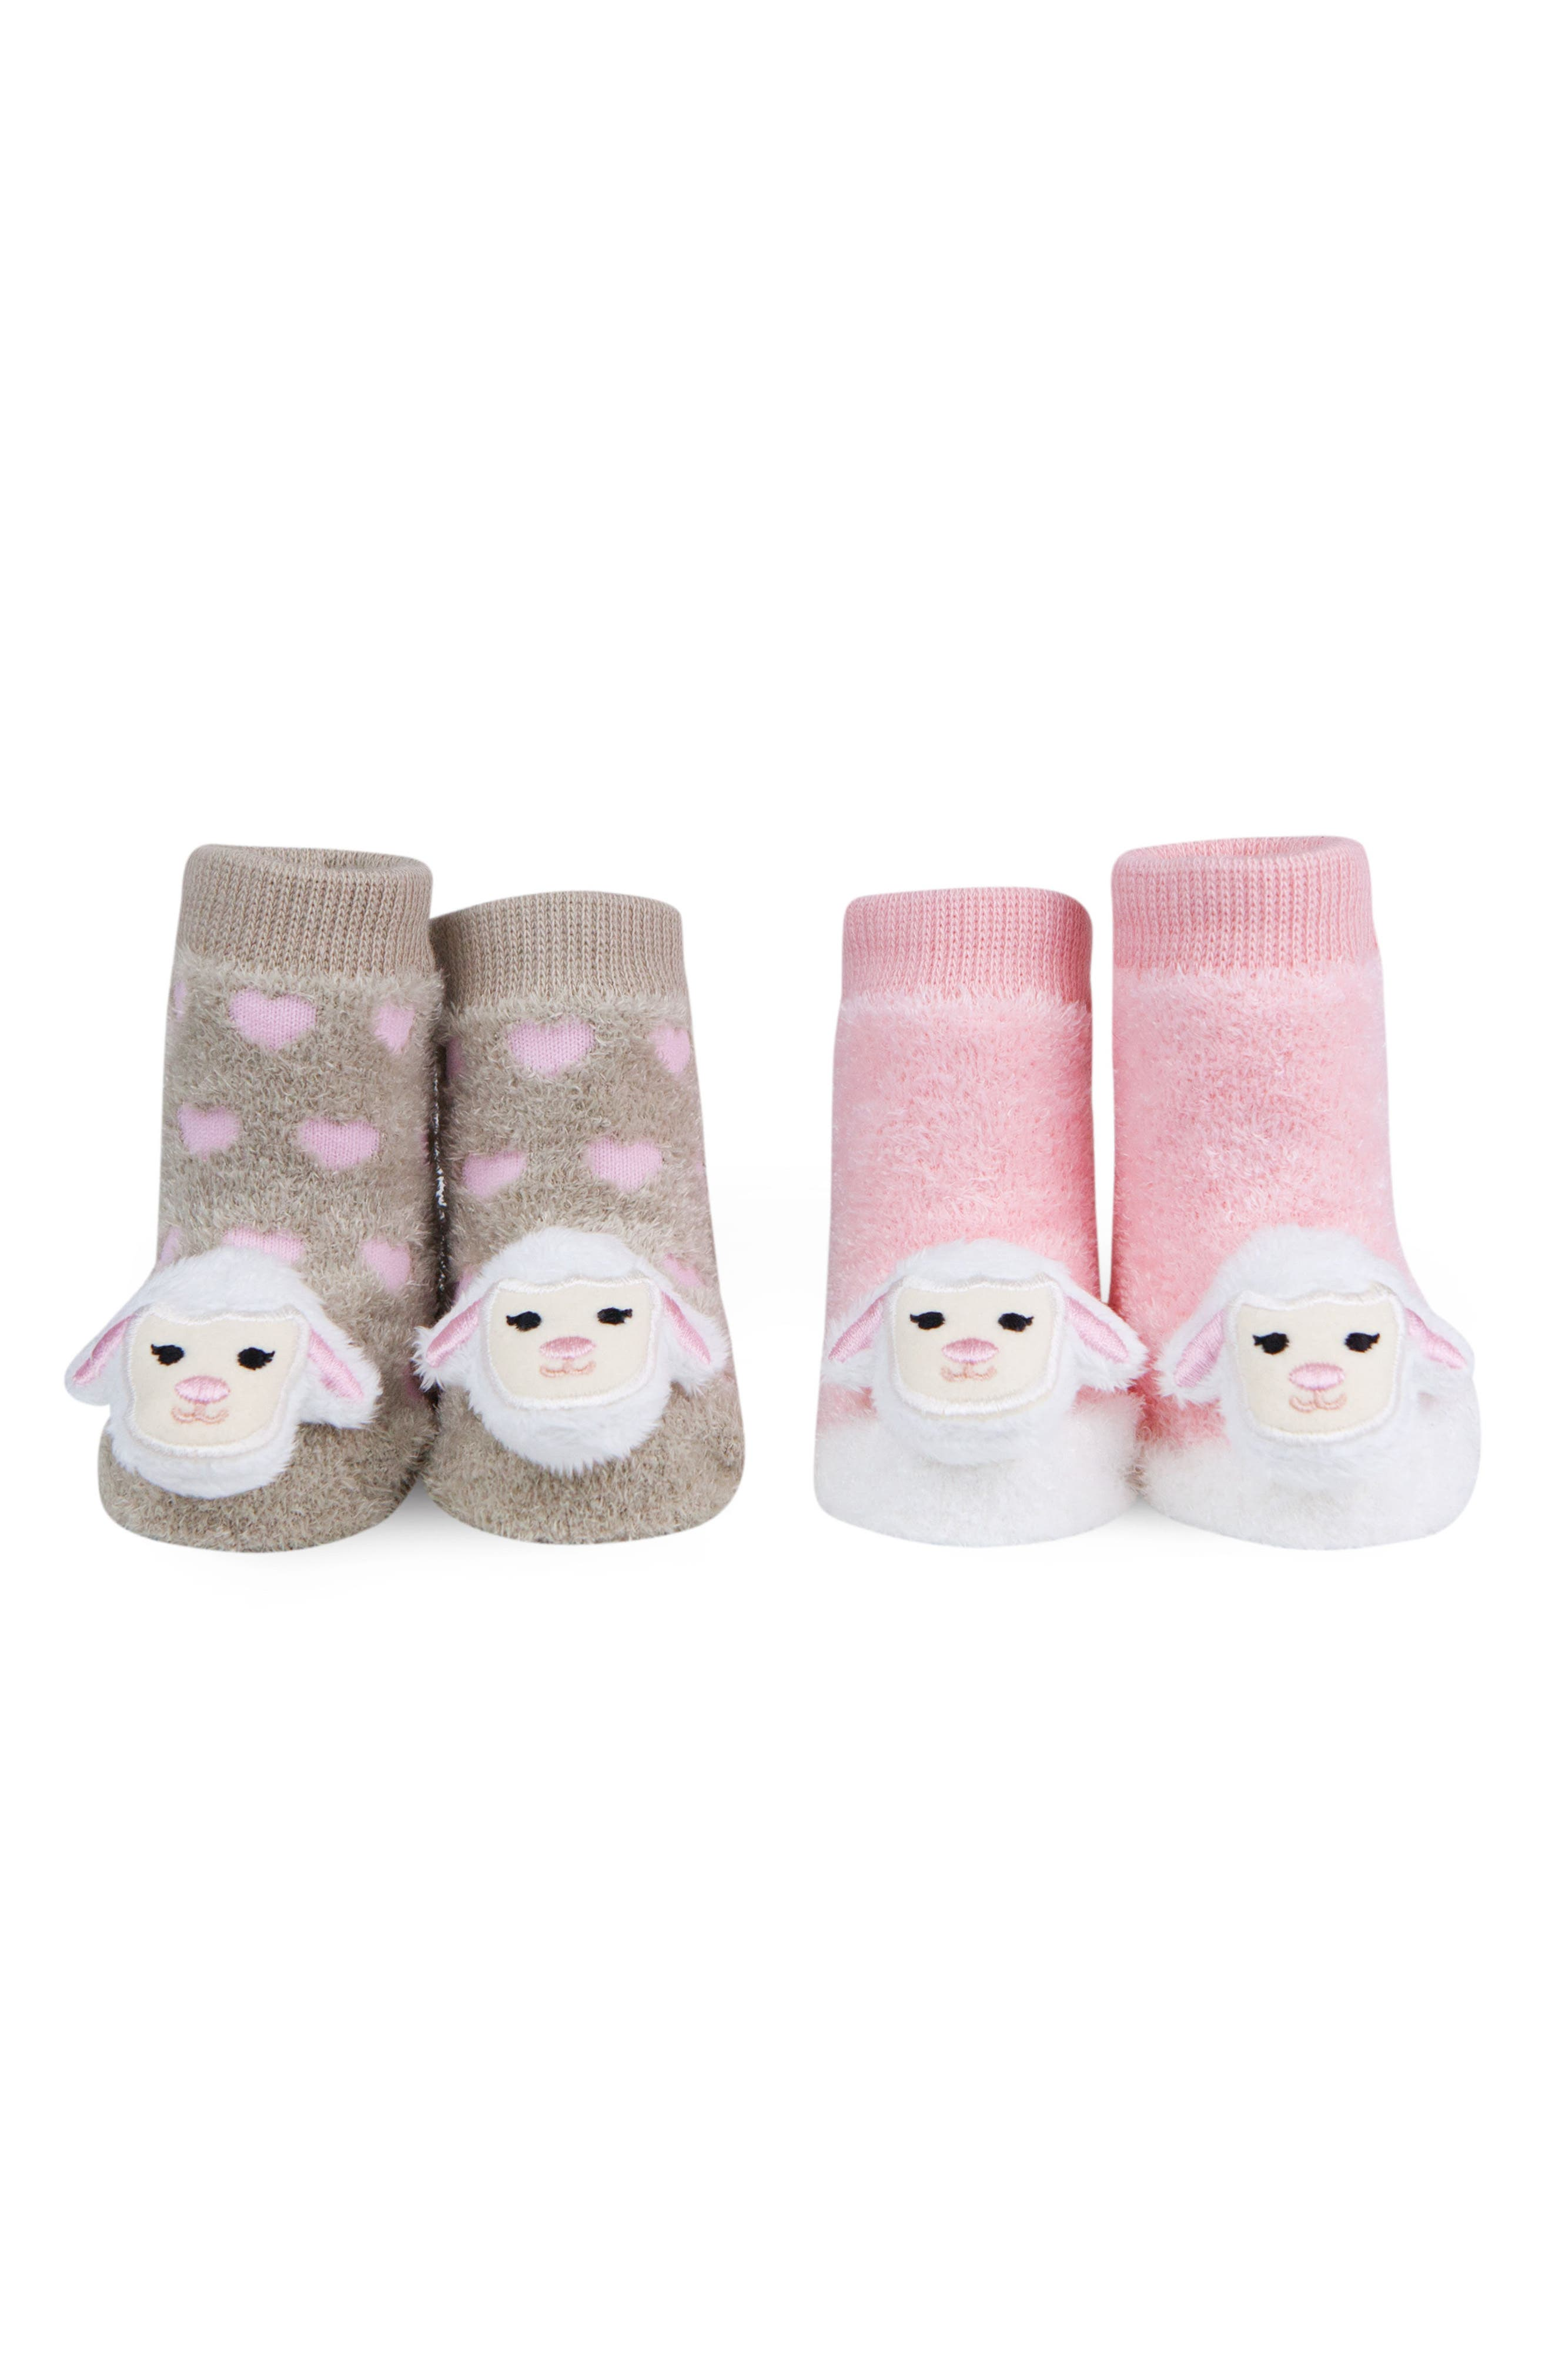 & Friends Lamb 2-Pack Rattle Socks,                             Main thumbnail 1, color,                             Pink/ Light Brown